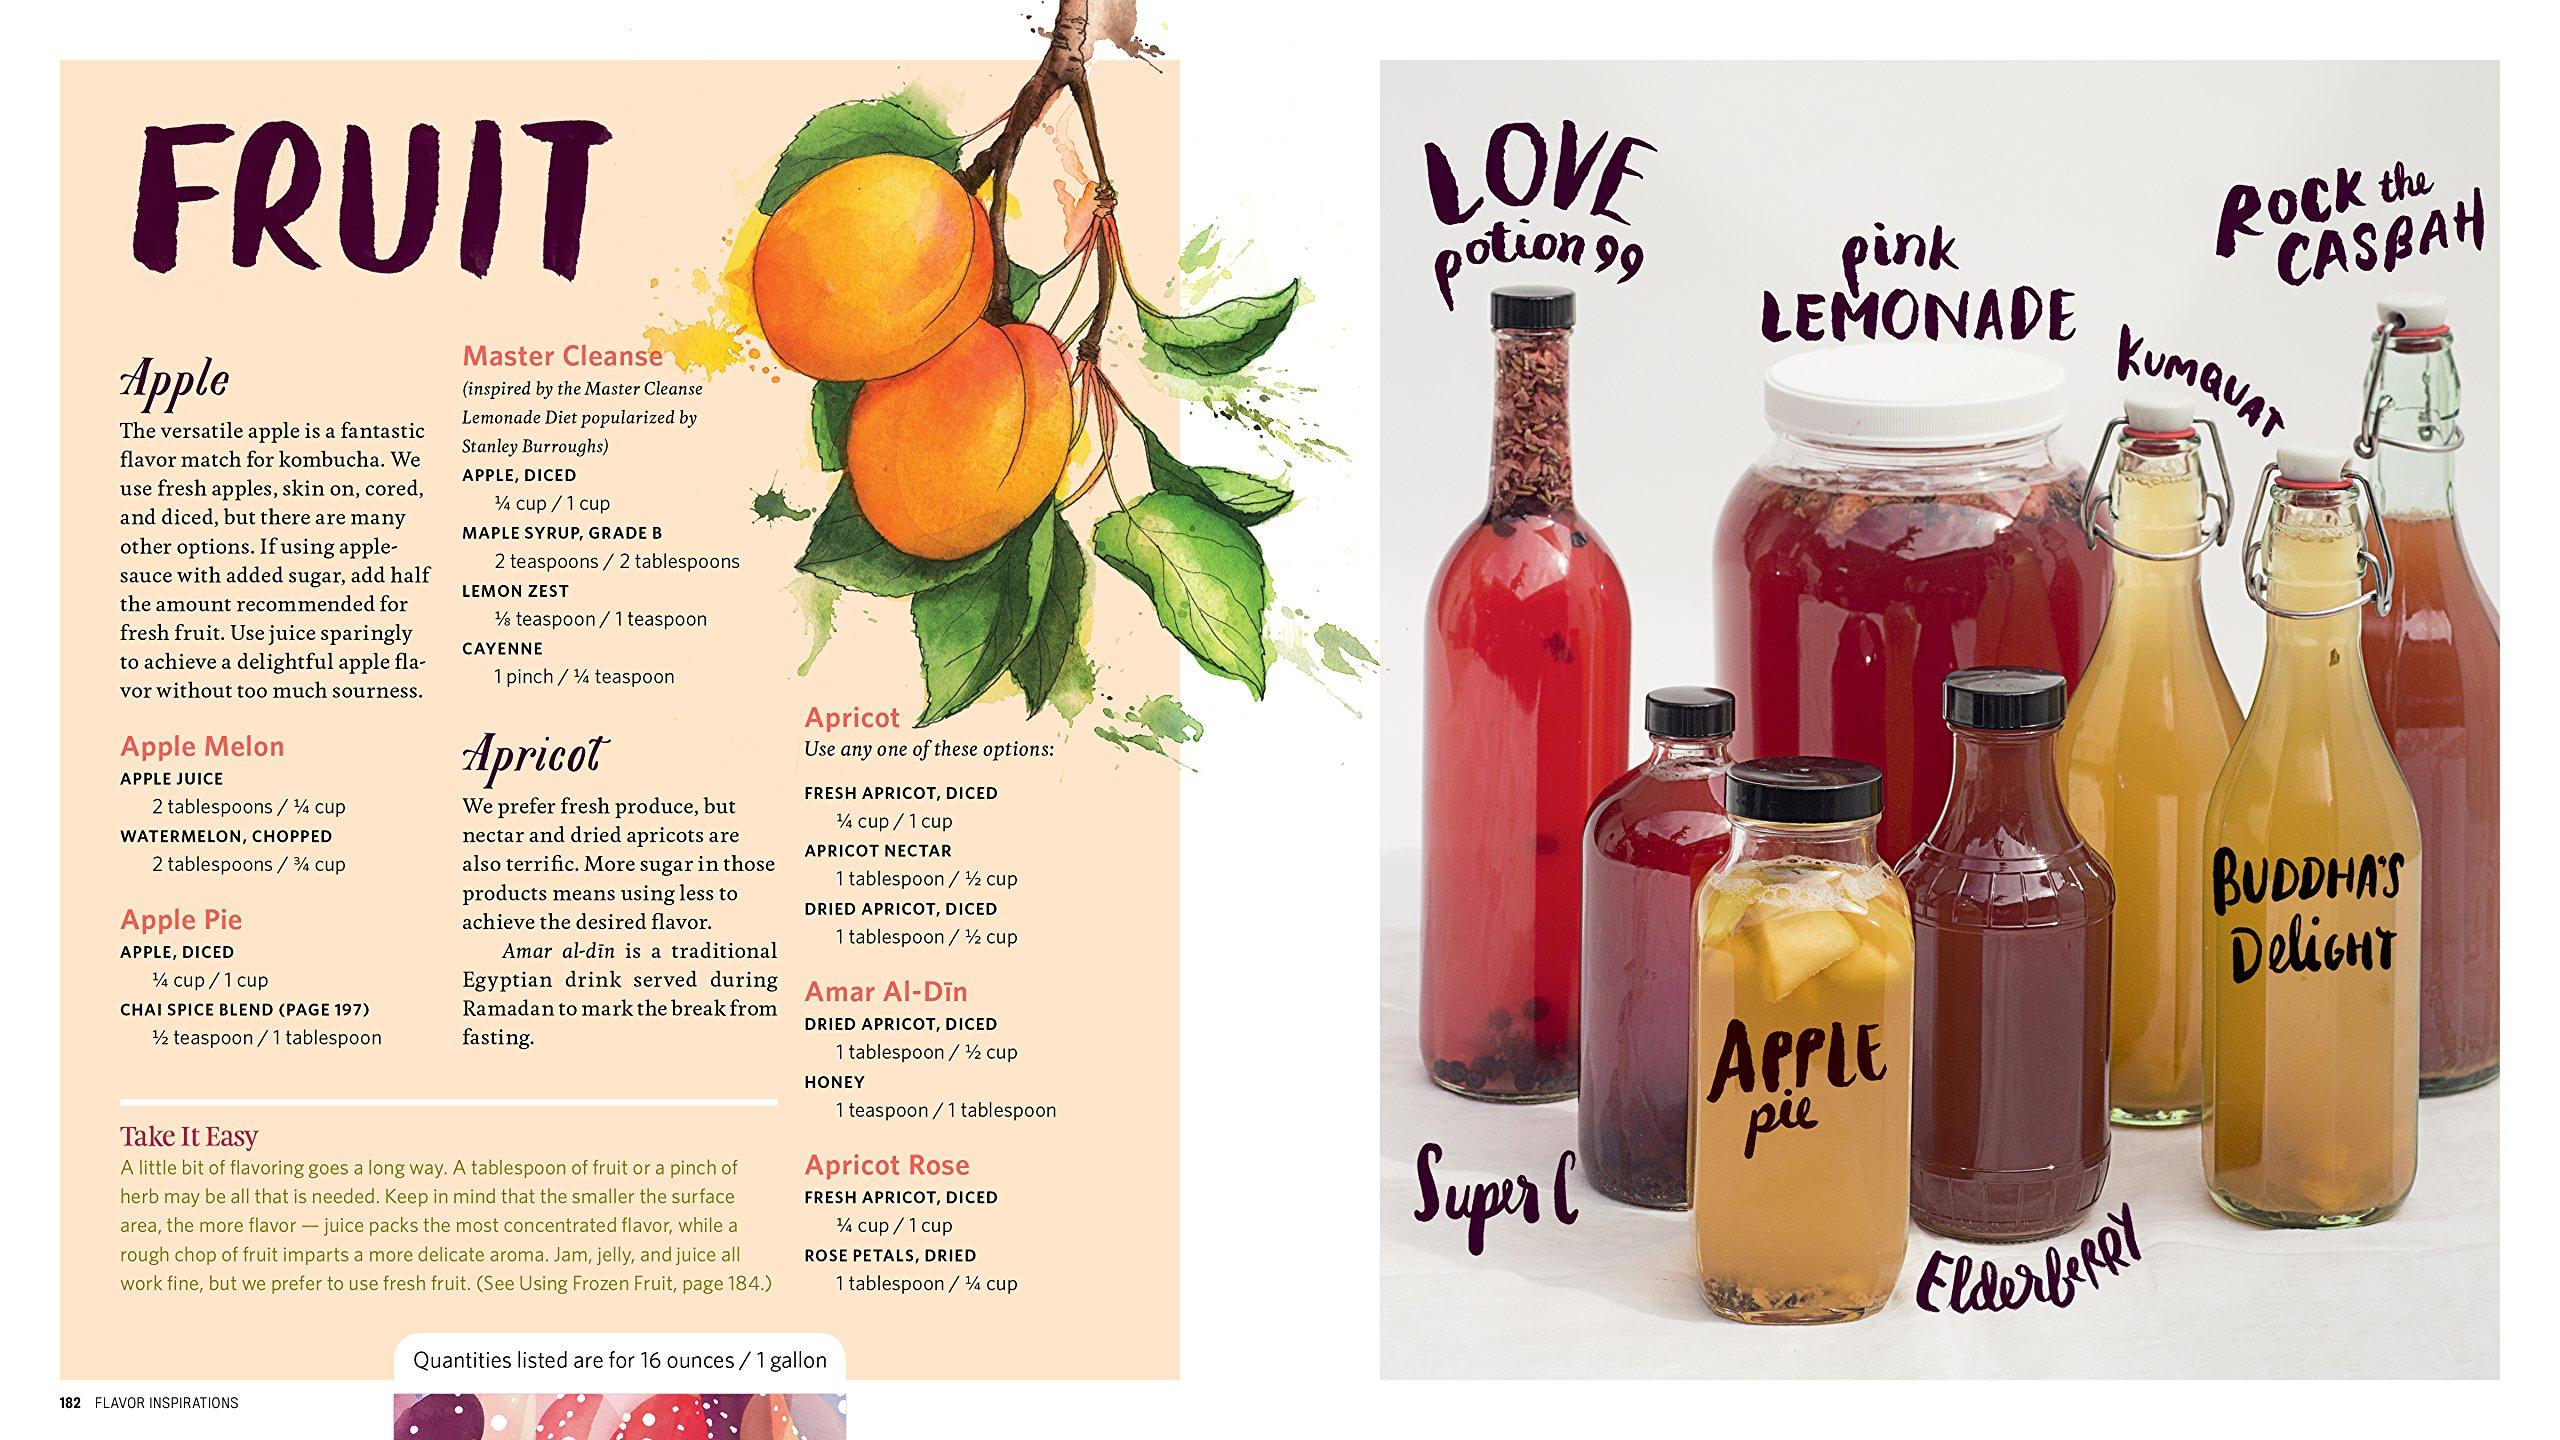 The Big Book Of Kombucha: Brewing, Flavoring, And Enjoying The Health  Benefits Of Fermented Tea: Hannah Crum, Alex Lagory, Sandor Ellix Katz:  9781612124339: